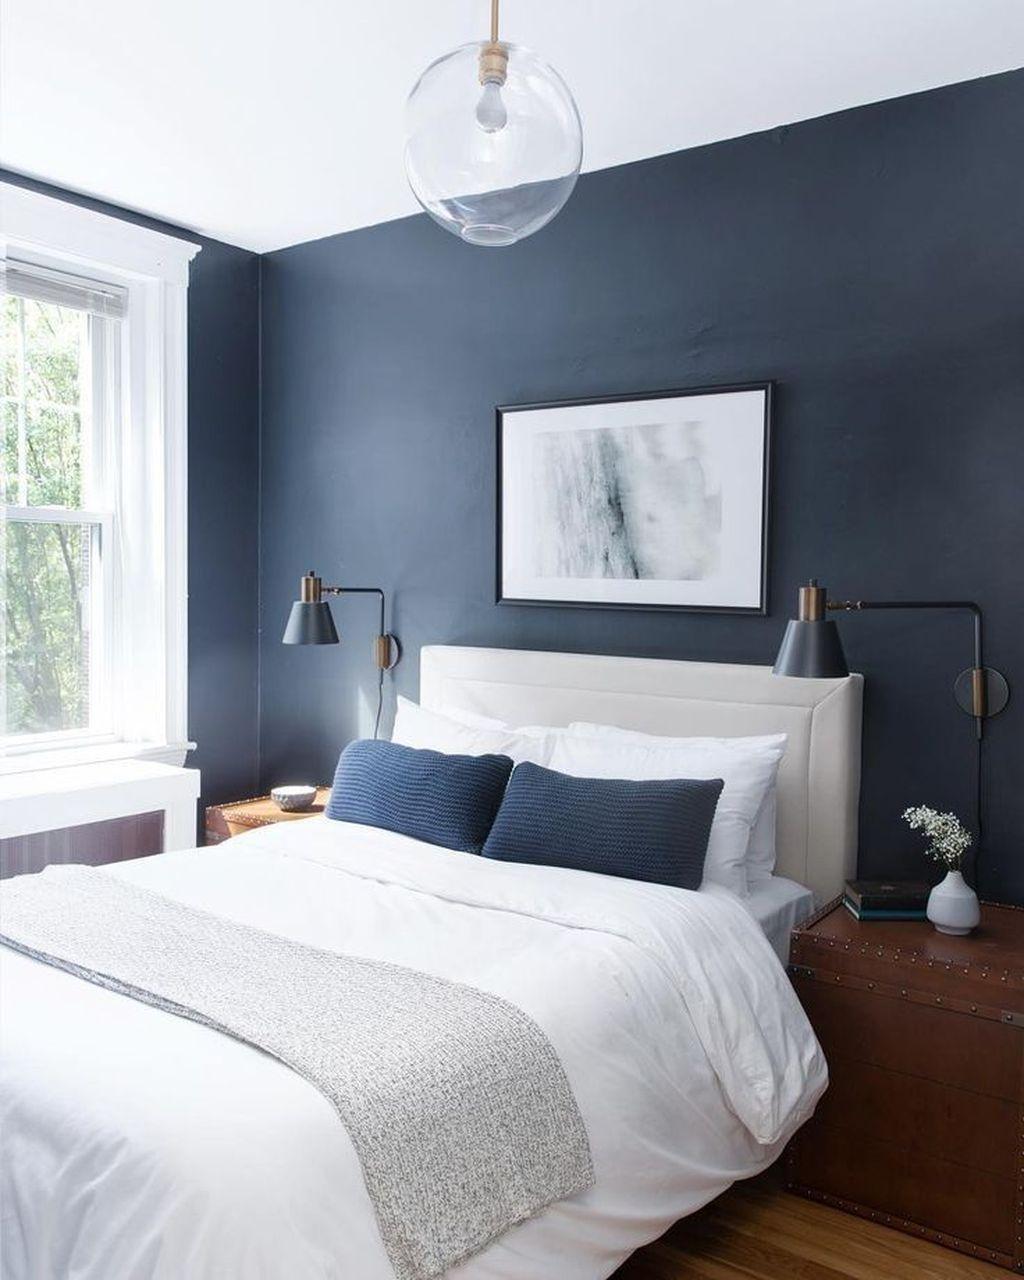 20 Inspiring Bedroom Design Ideas To Apply Asap Coodecor Blue Master Bedroom Bedroom Interior Home Decor Bedroom Minimalist blue room paint